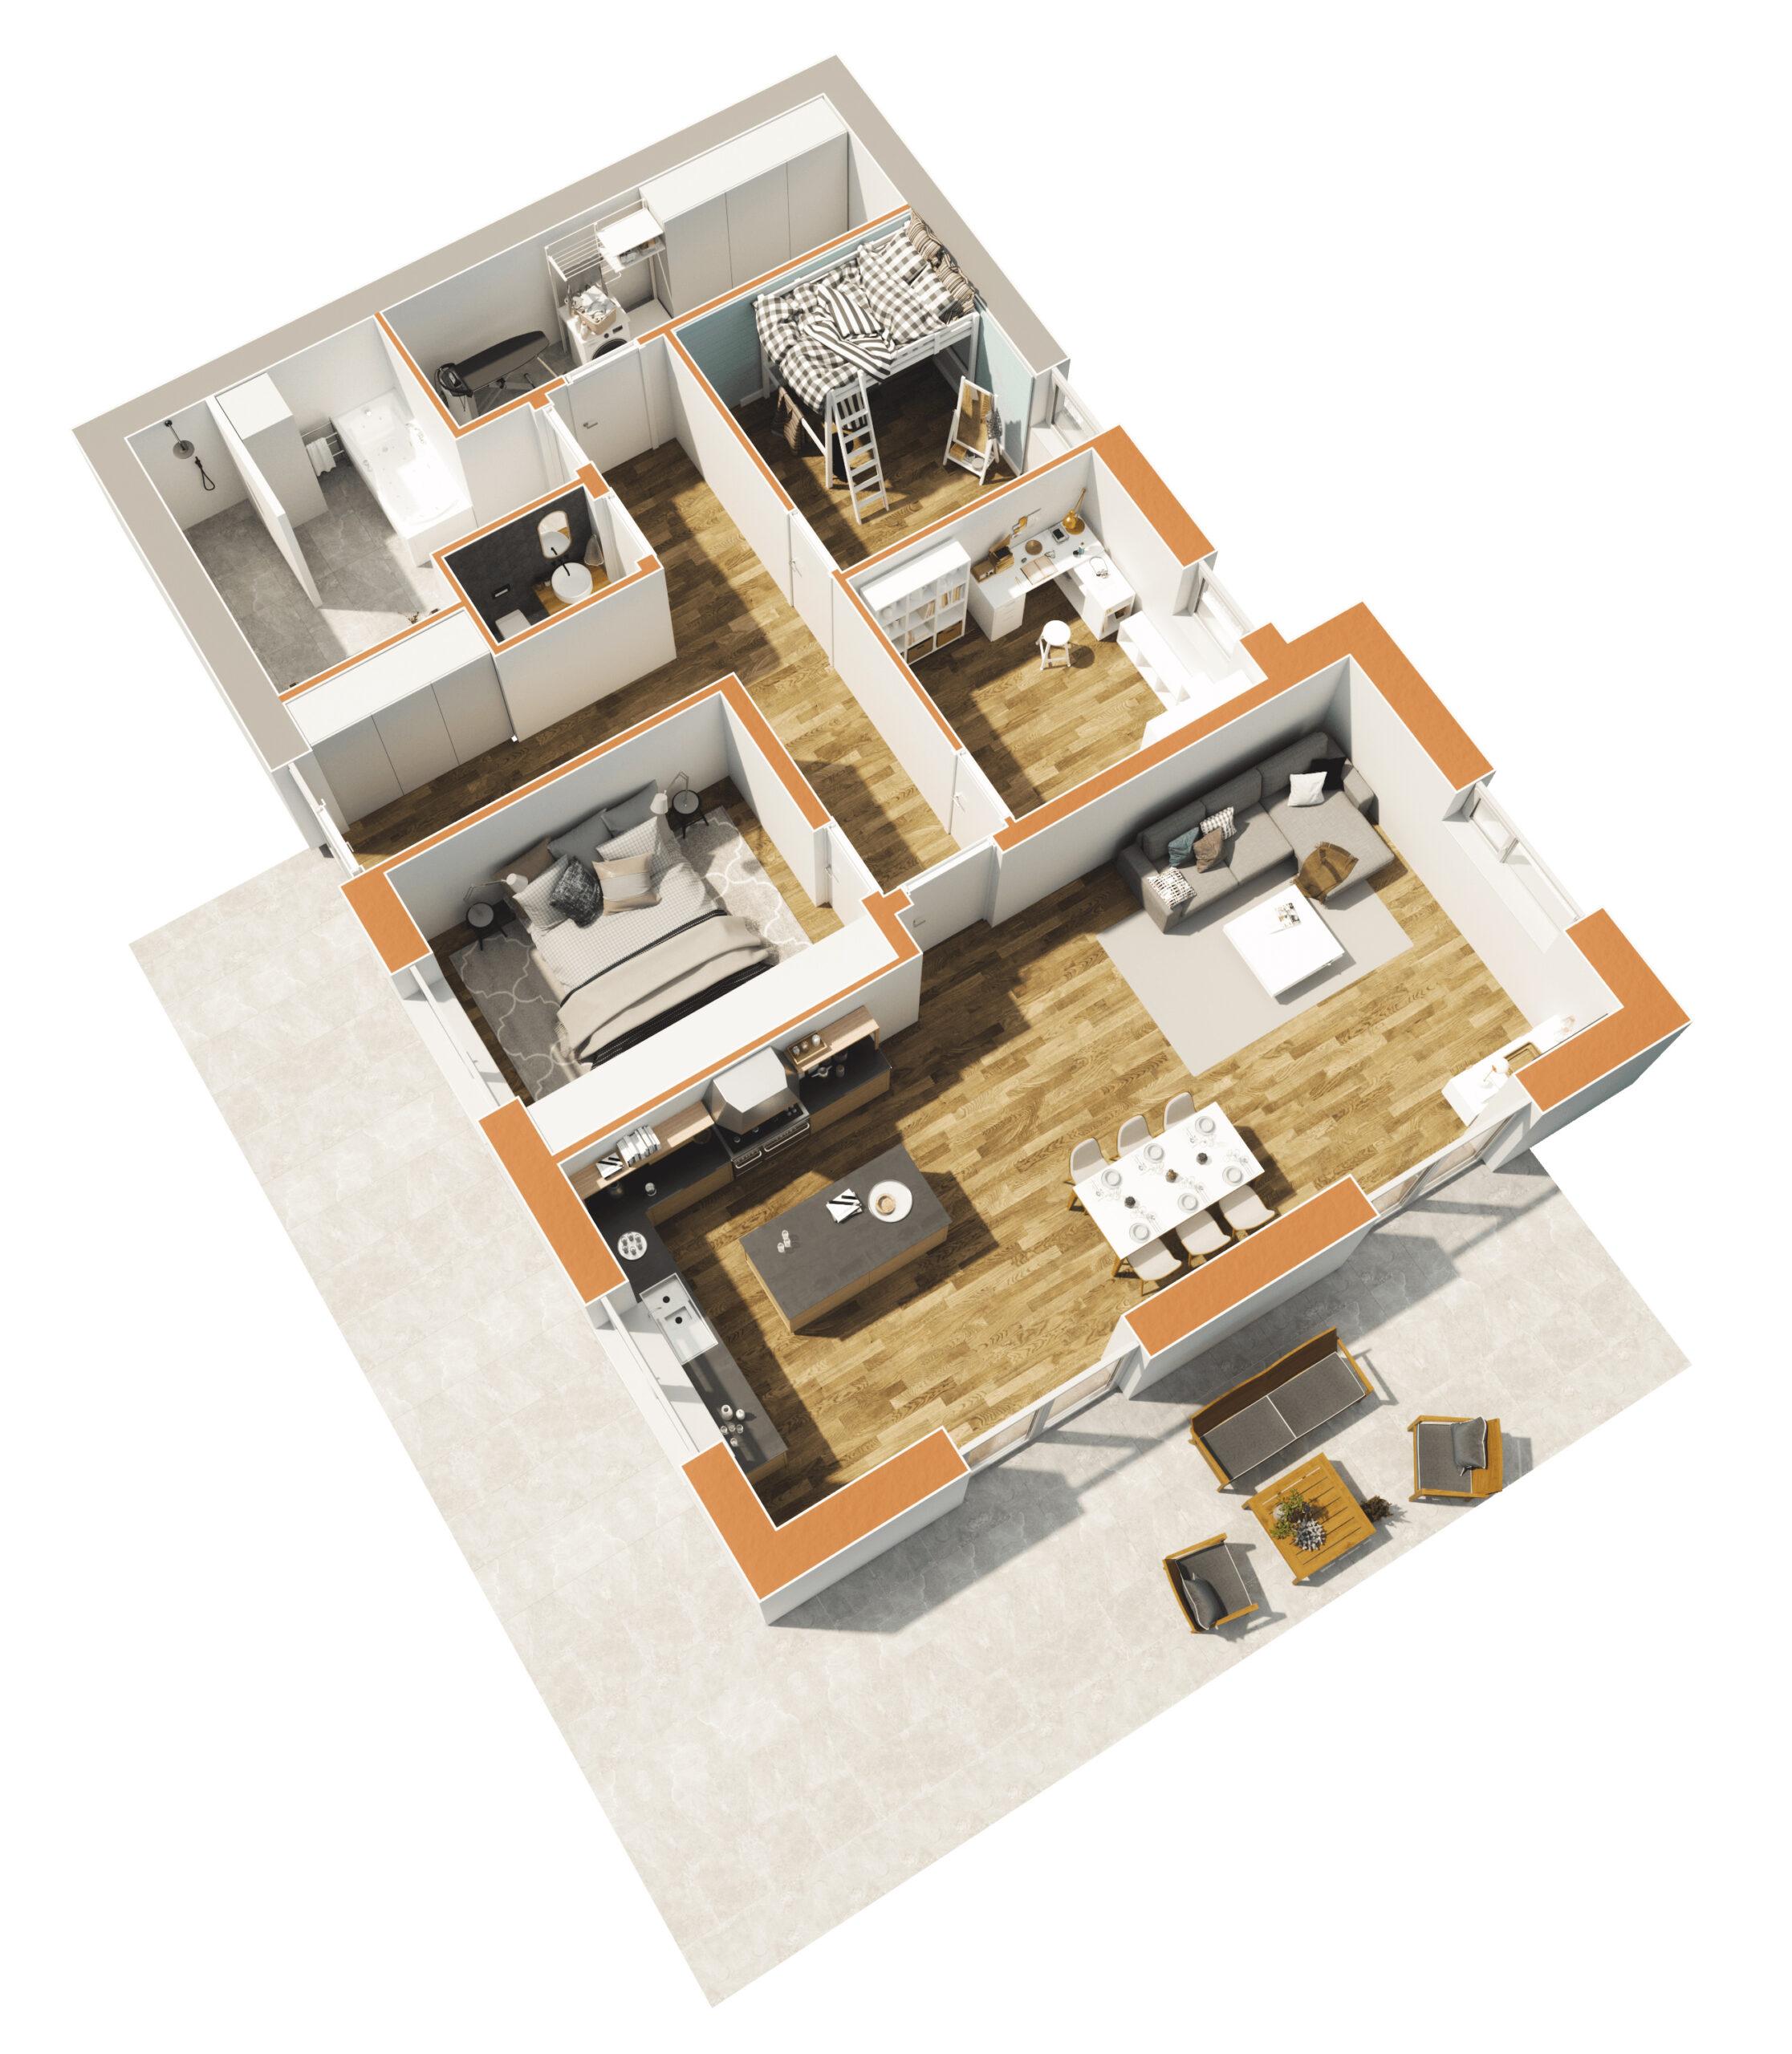 Haus 3 - Untergeschoss